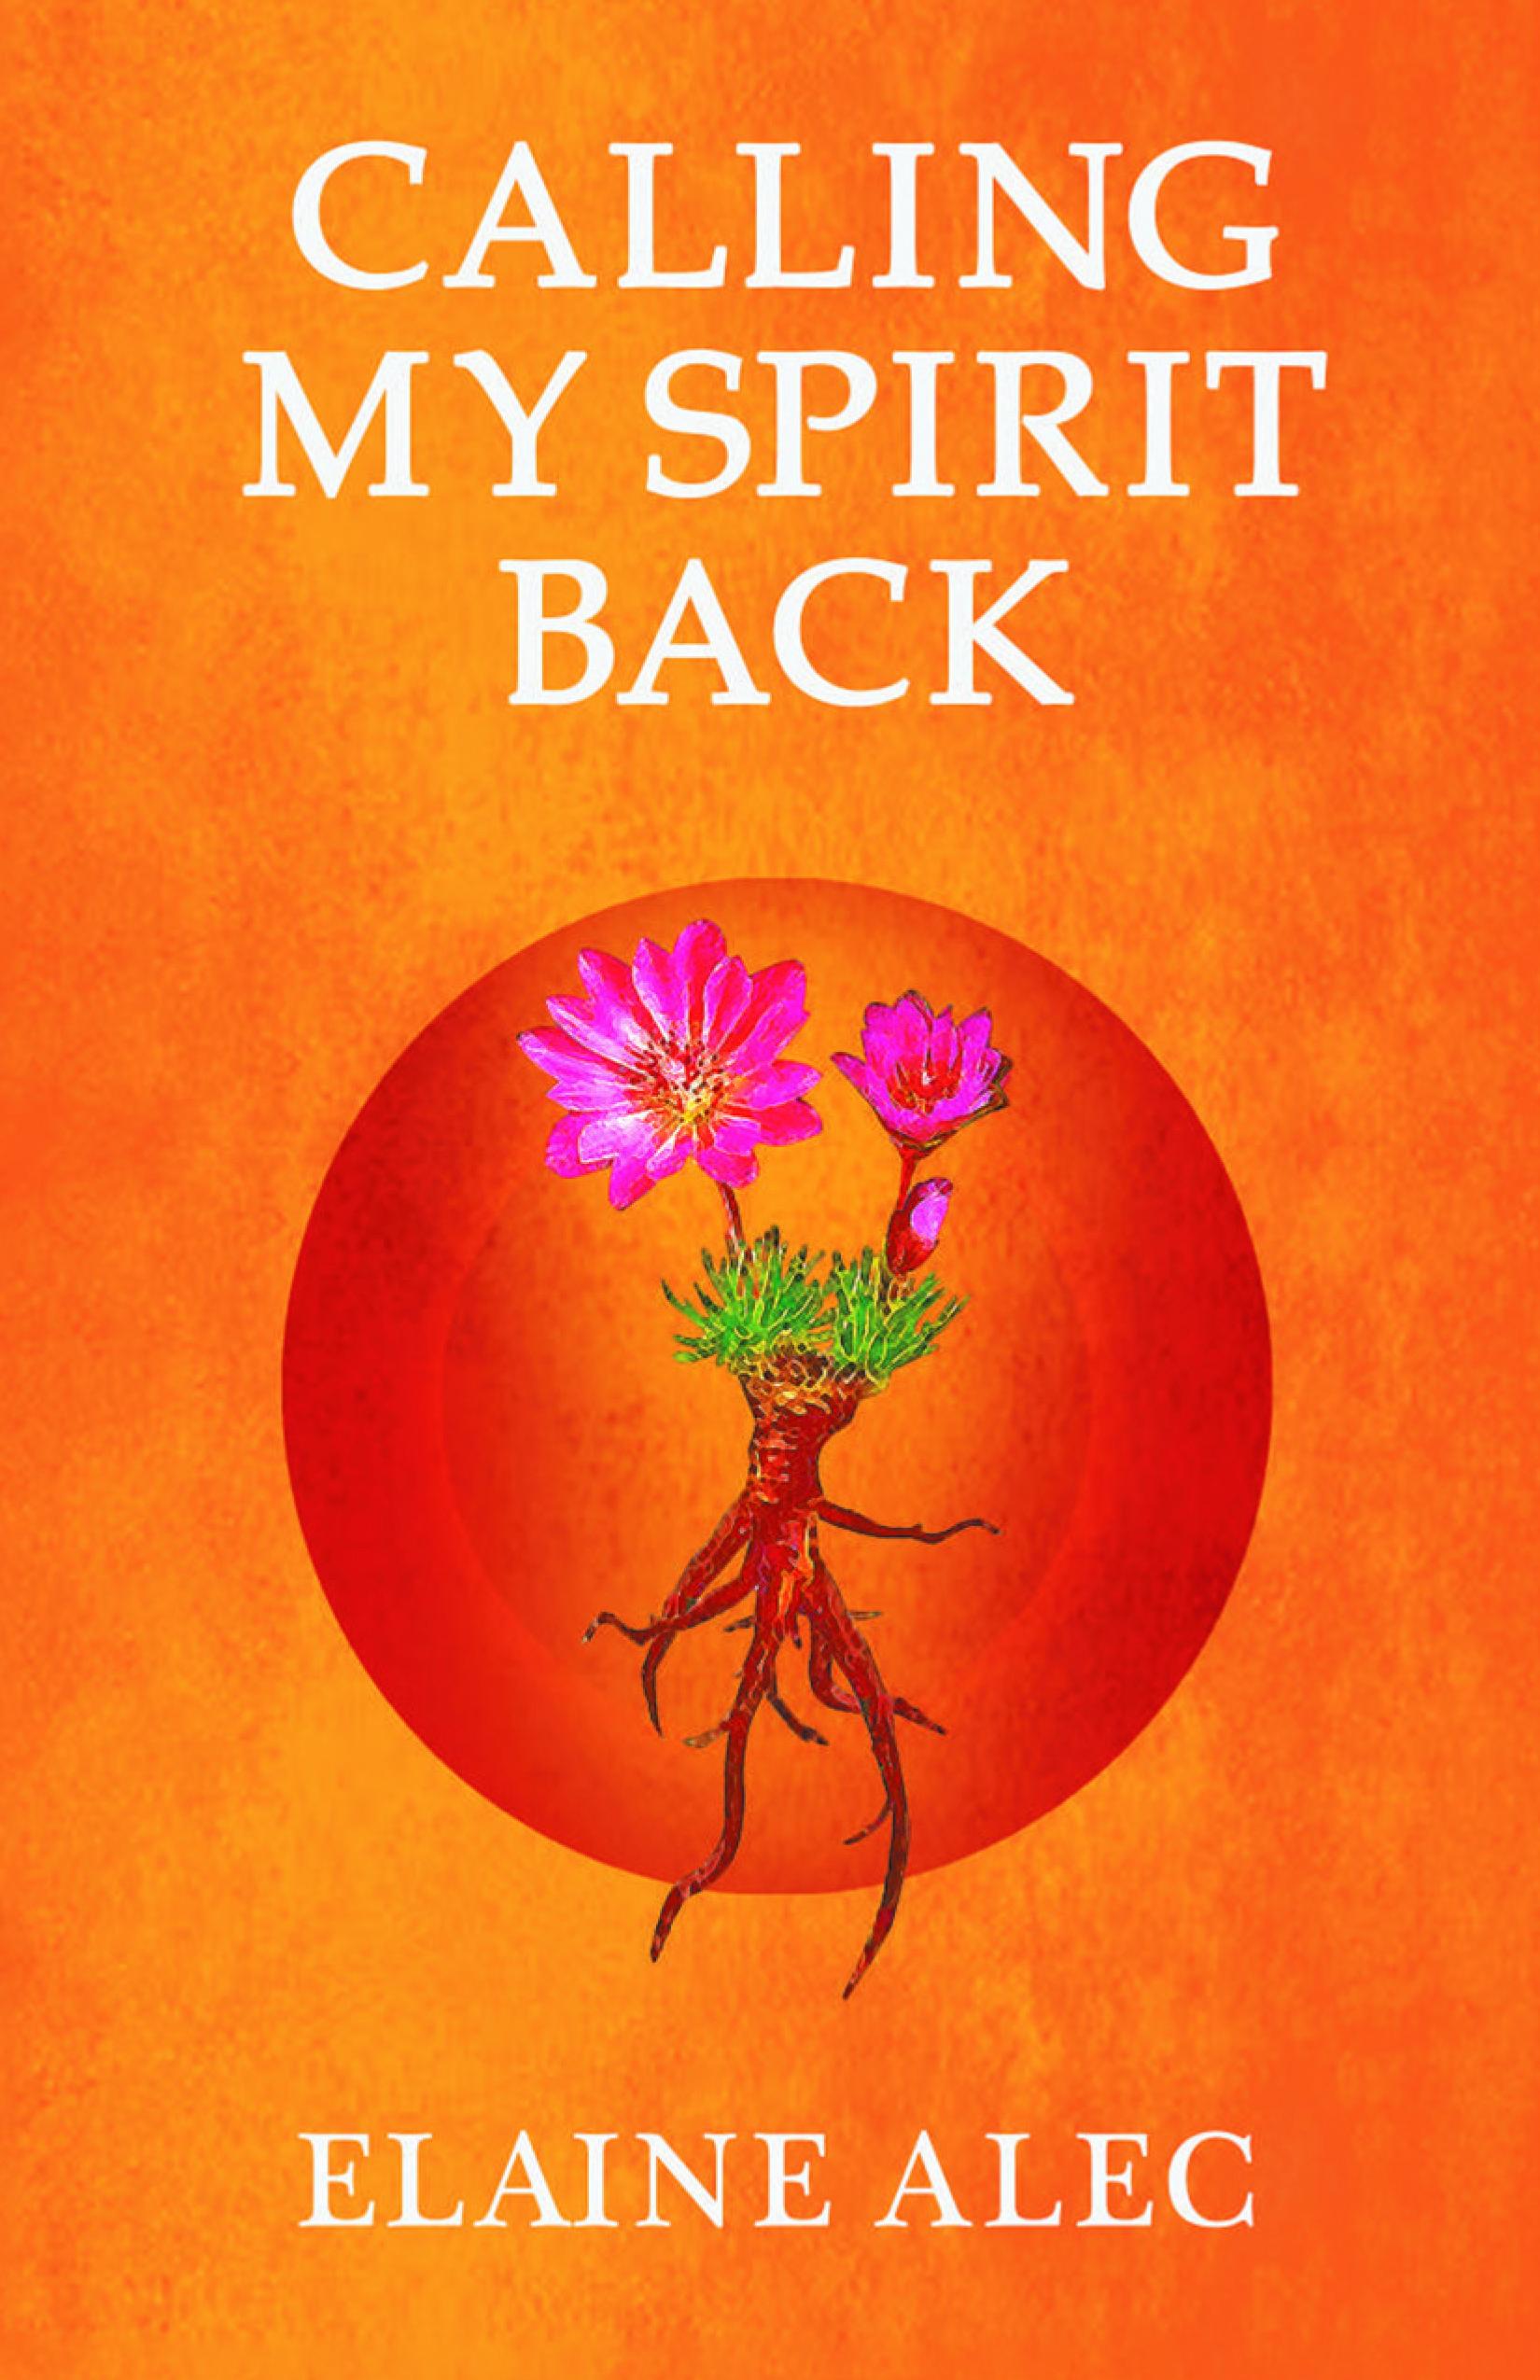 [PDF] [EPUB] Calling My Spirit Back Download by Elaine Alec